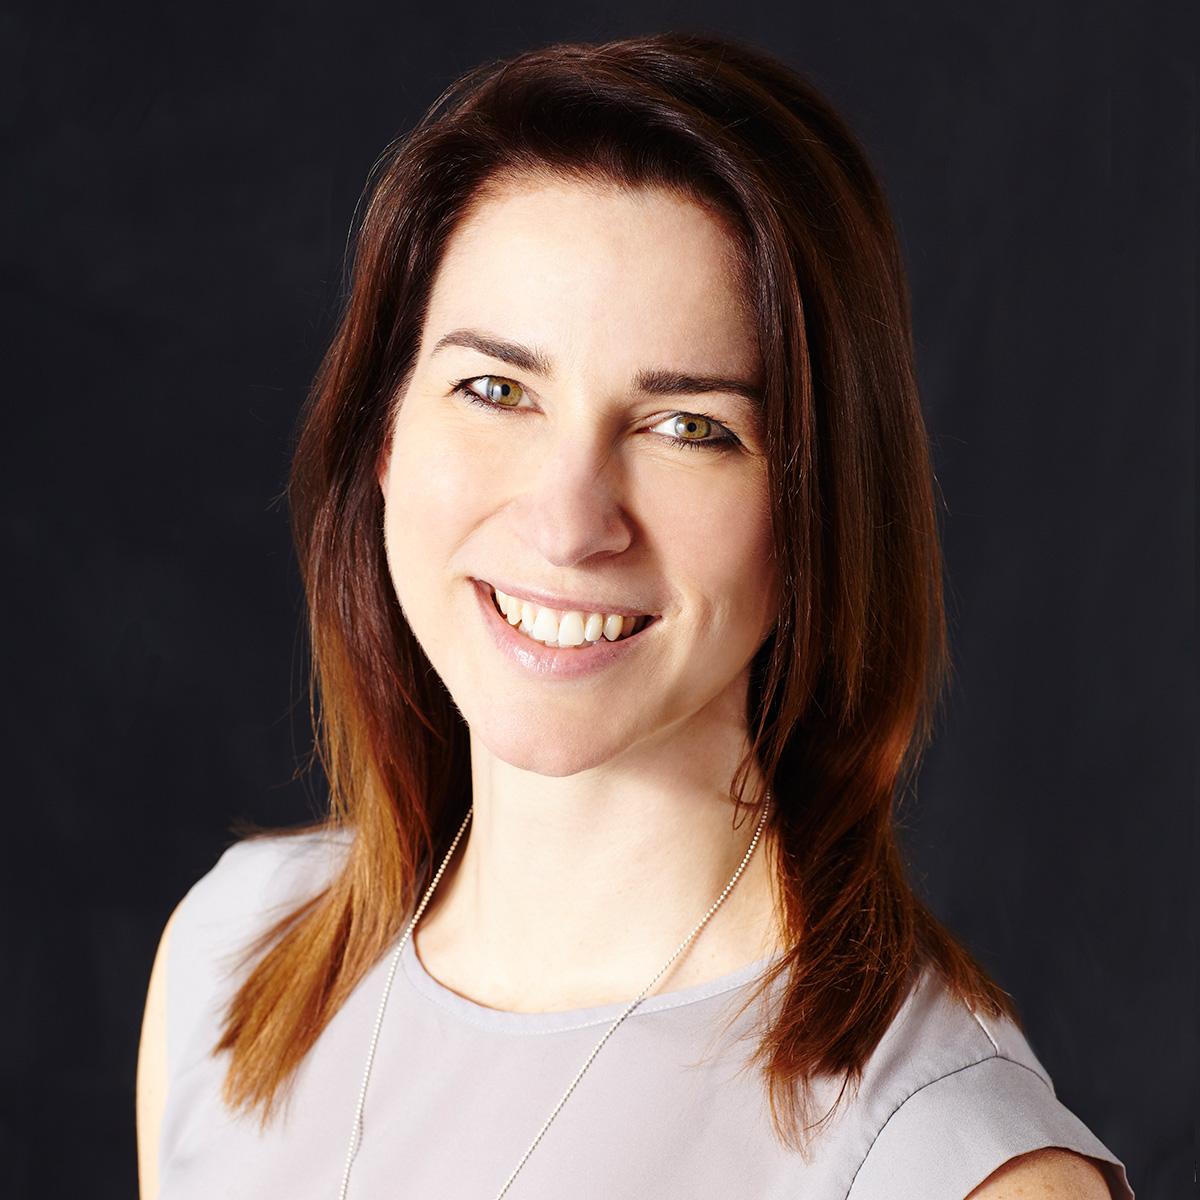 Debby Penton Profile Image